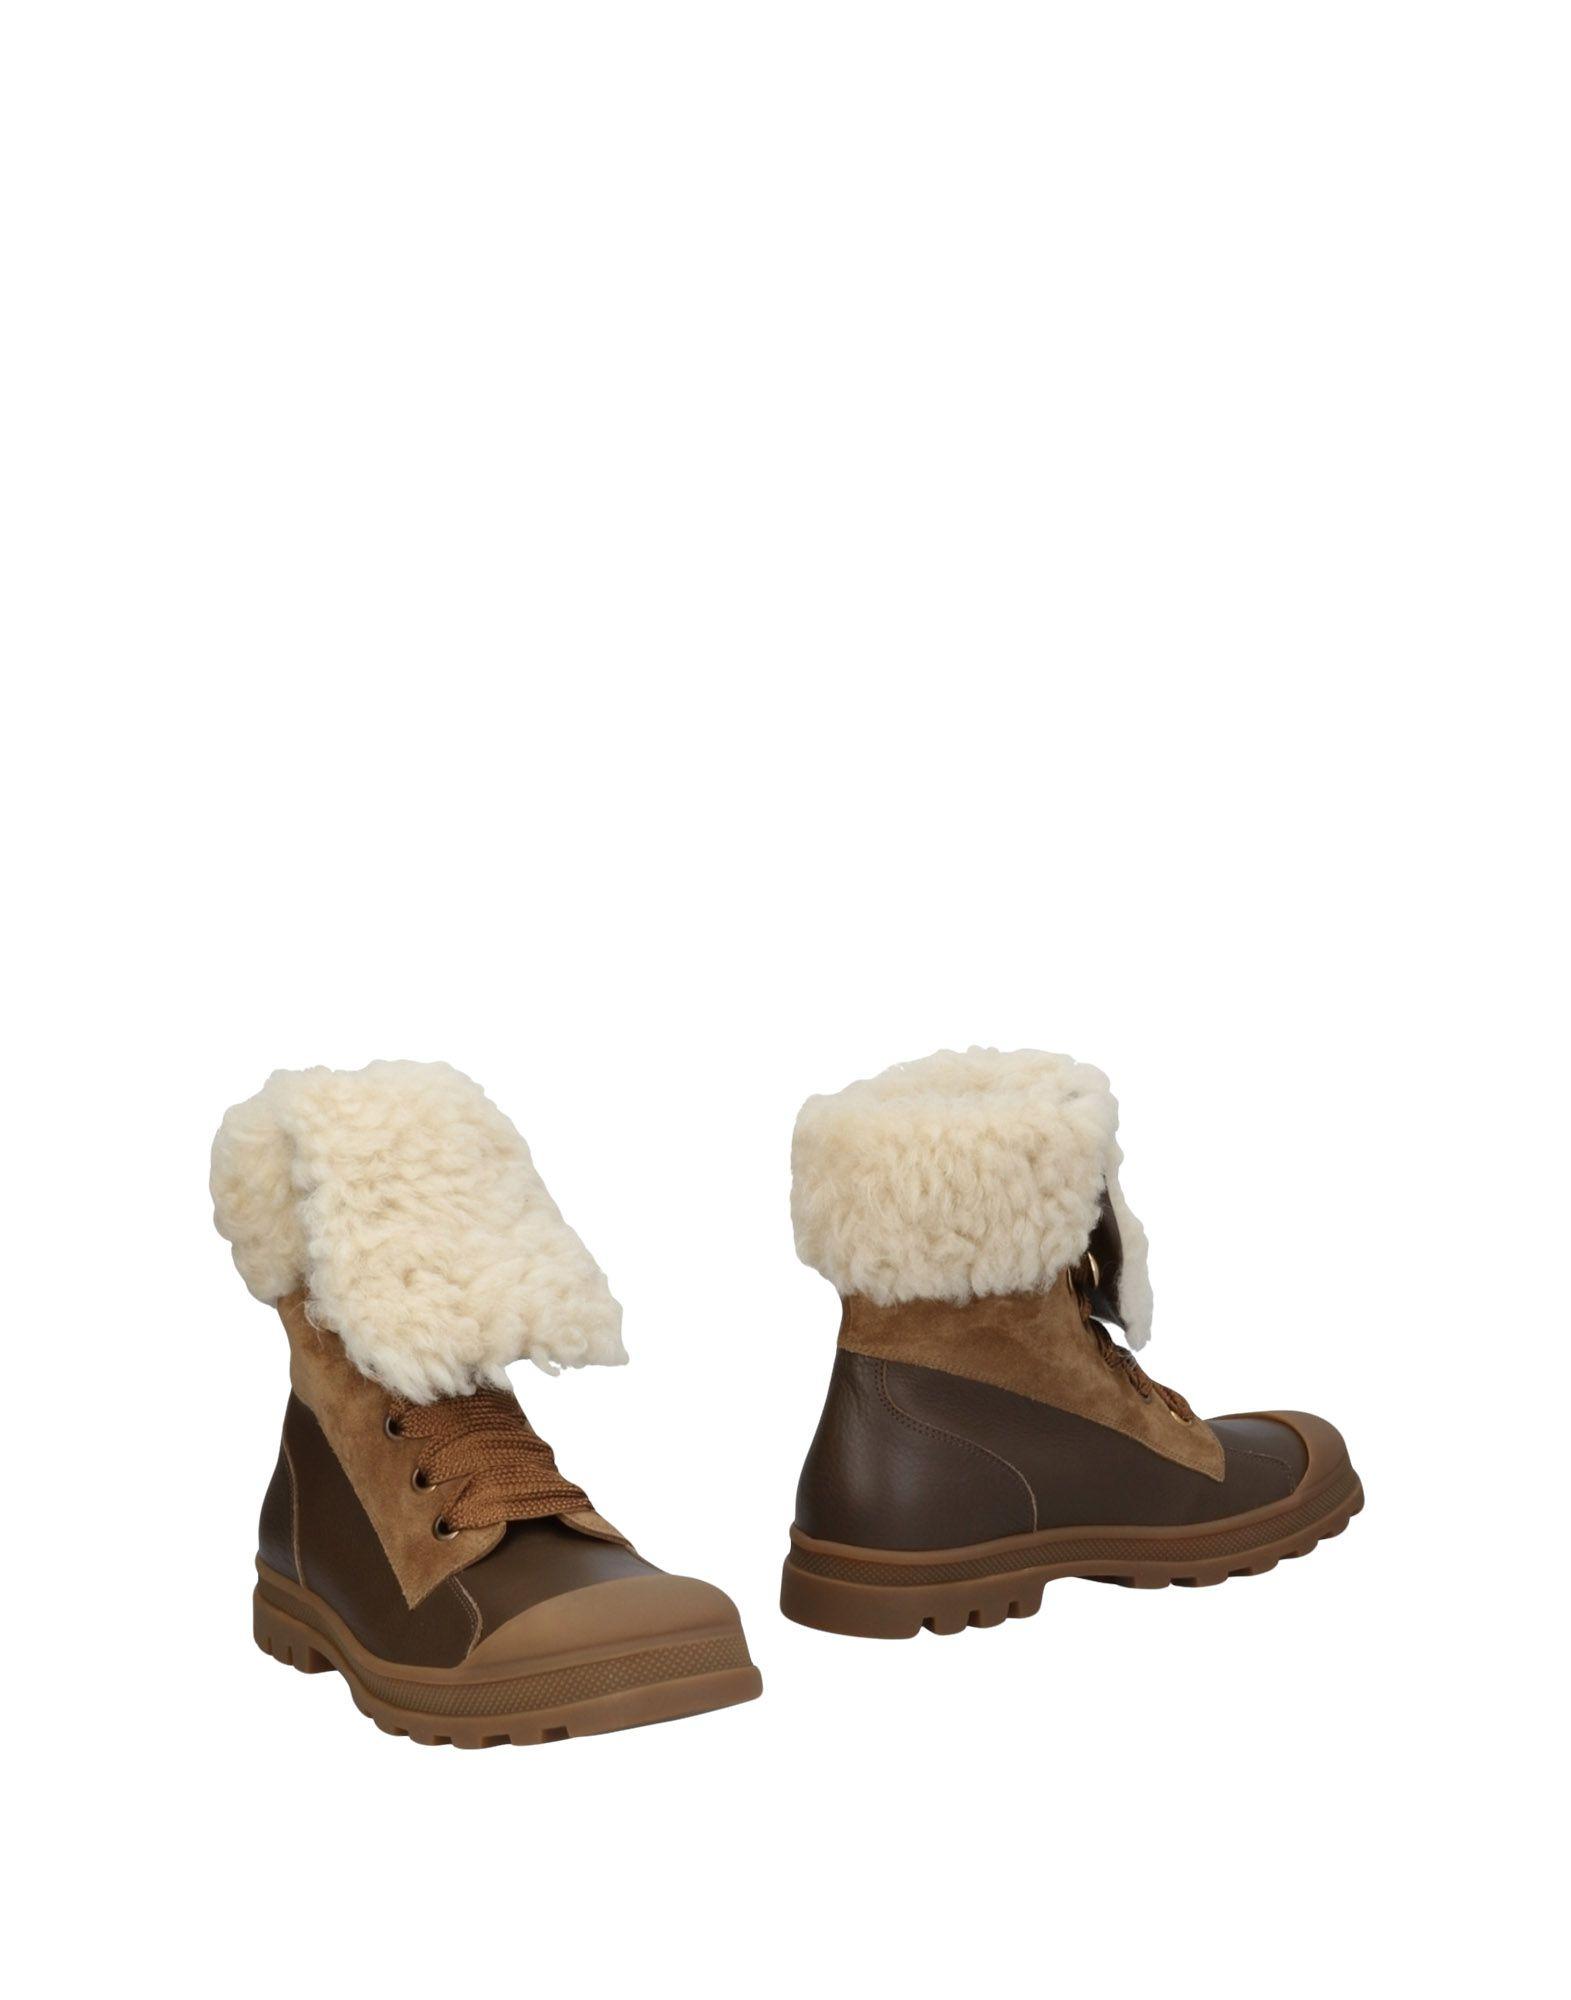 Chloé Ankle Boot - Women Chloé  Ankle Boots online on  Chloé Australia - 11464649NV 85656e